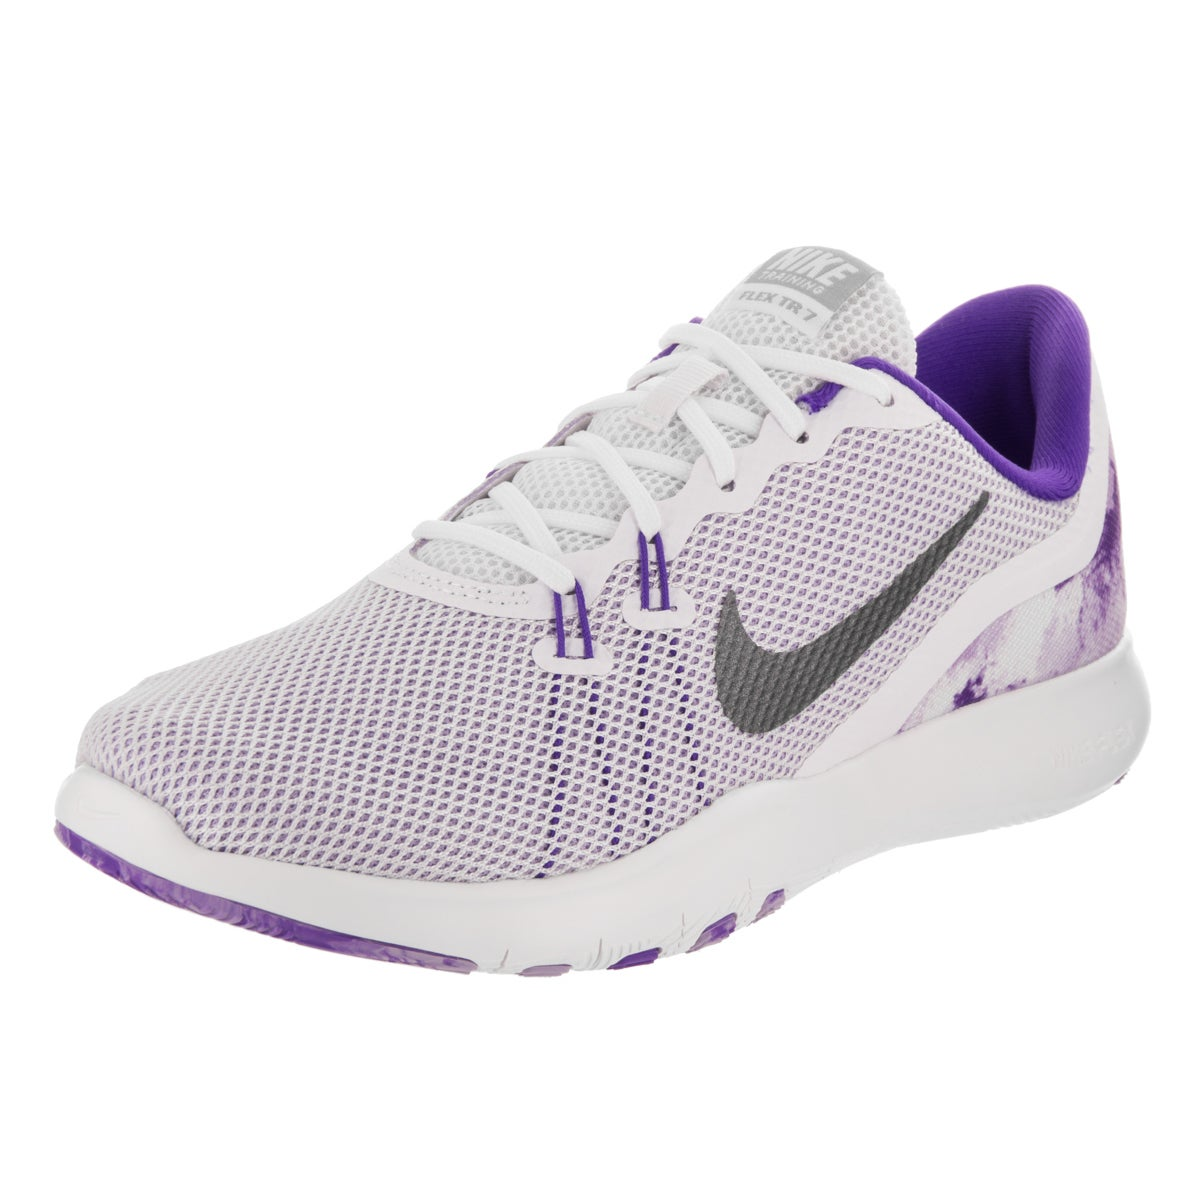 7dfe1746b620f Shop Nike Women s Flex Trainer 7 Print Training Shoe - Free Shipping Today  - Overstock.com - 16850390